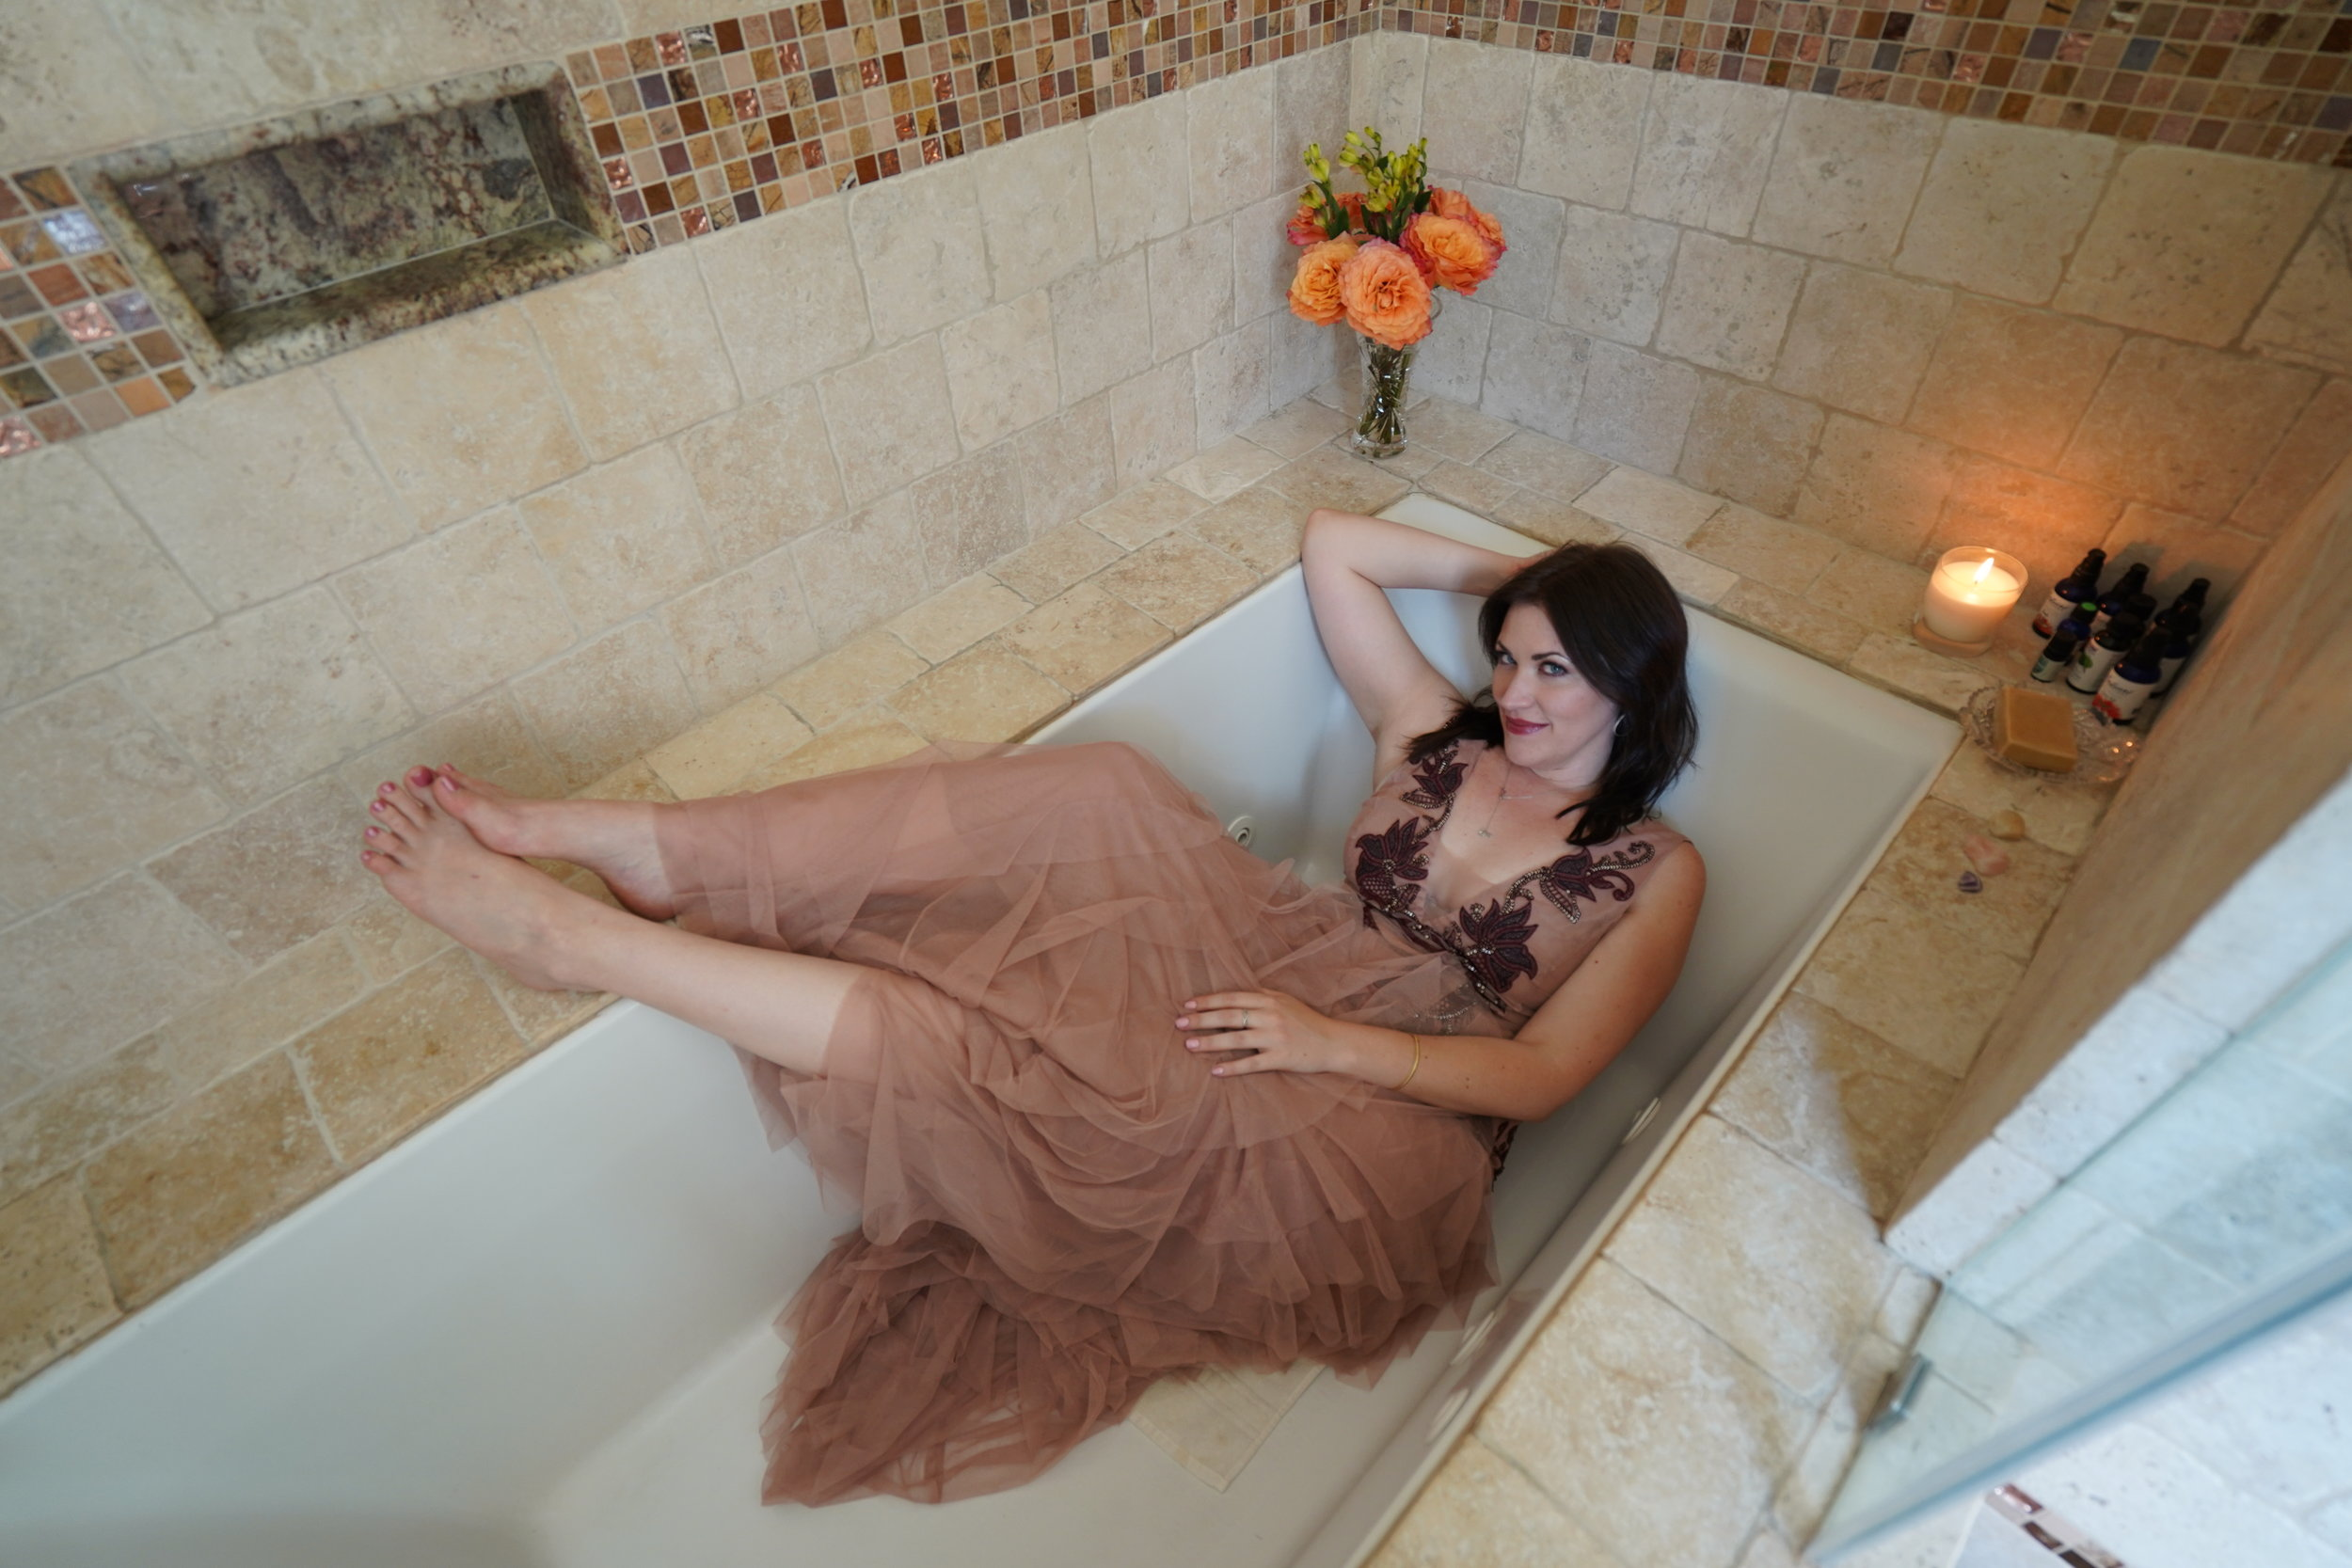 Photo by Megan Wintory  Hair by Andrea Jaclyn / Bomane Salon  Dress by BCBGMAXAZRIA